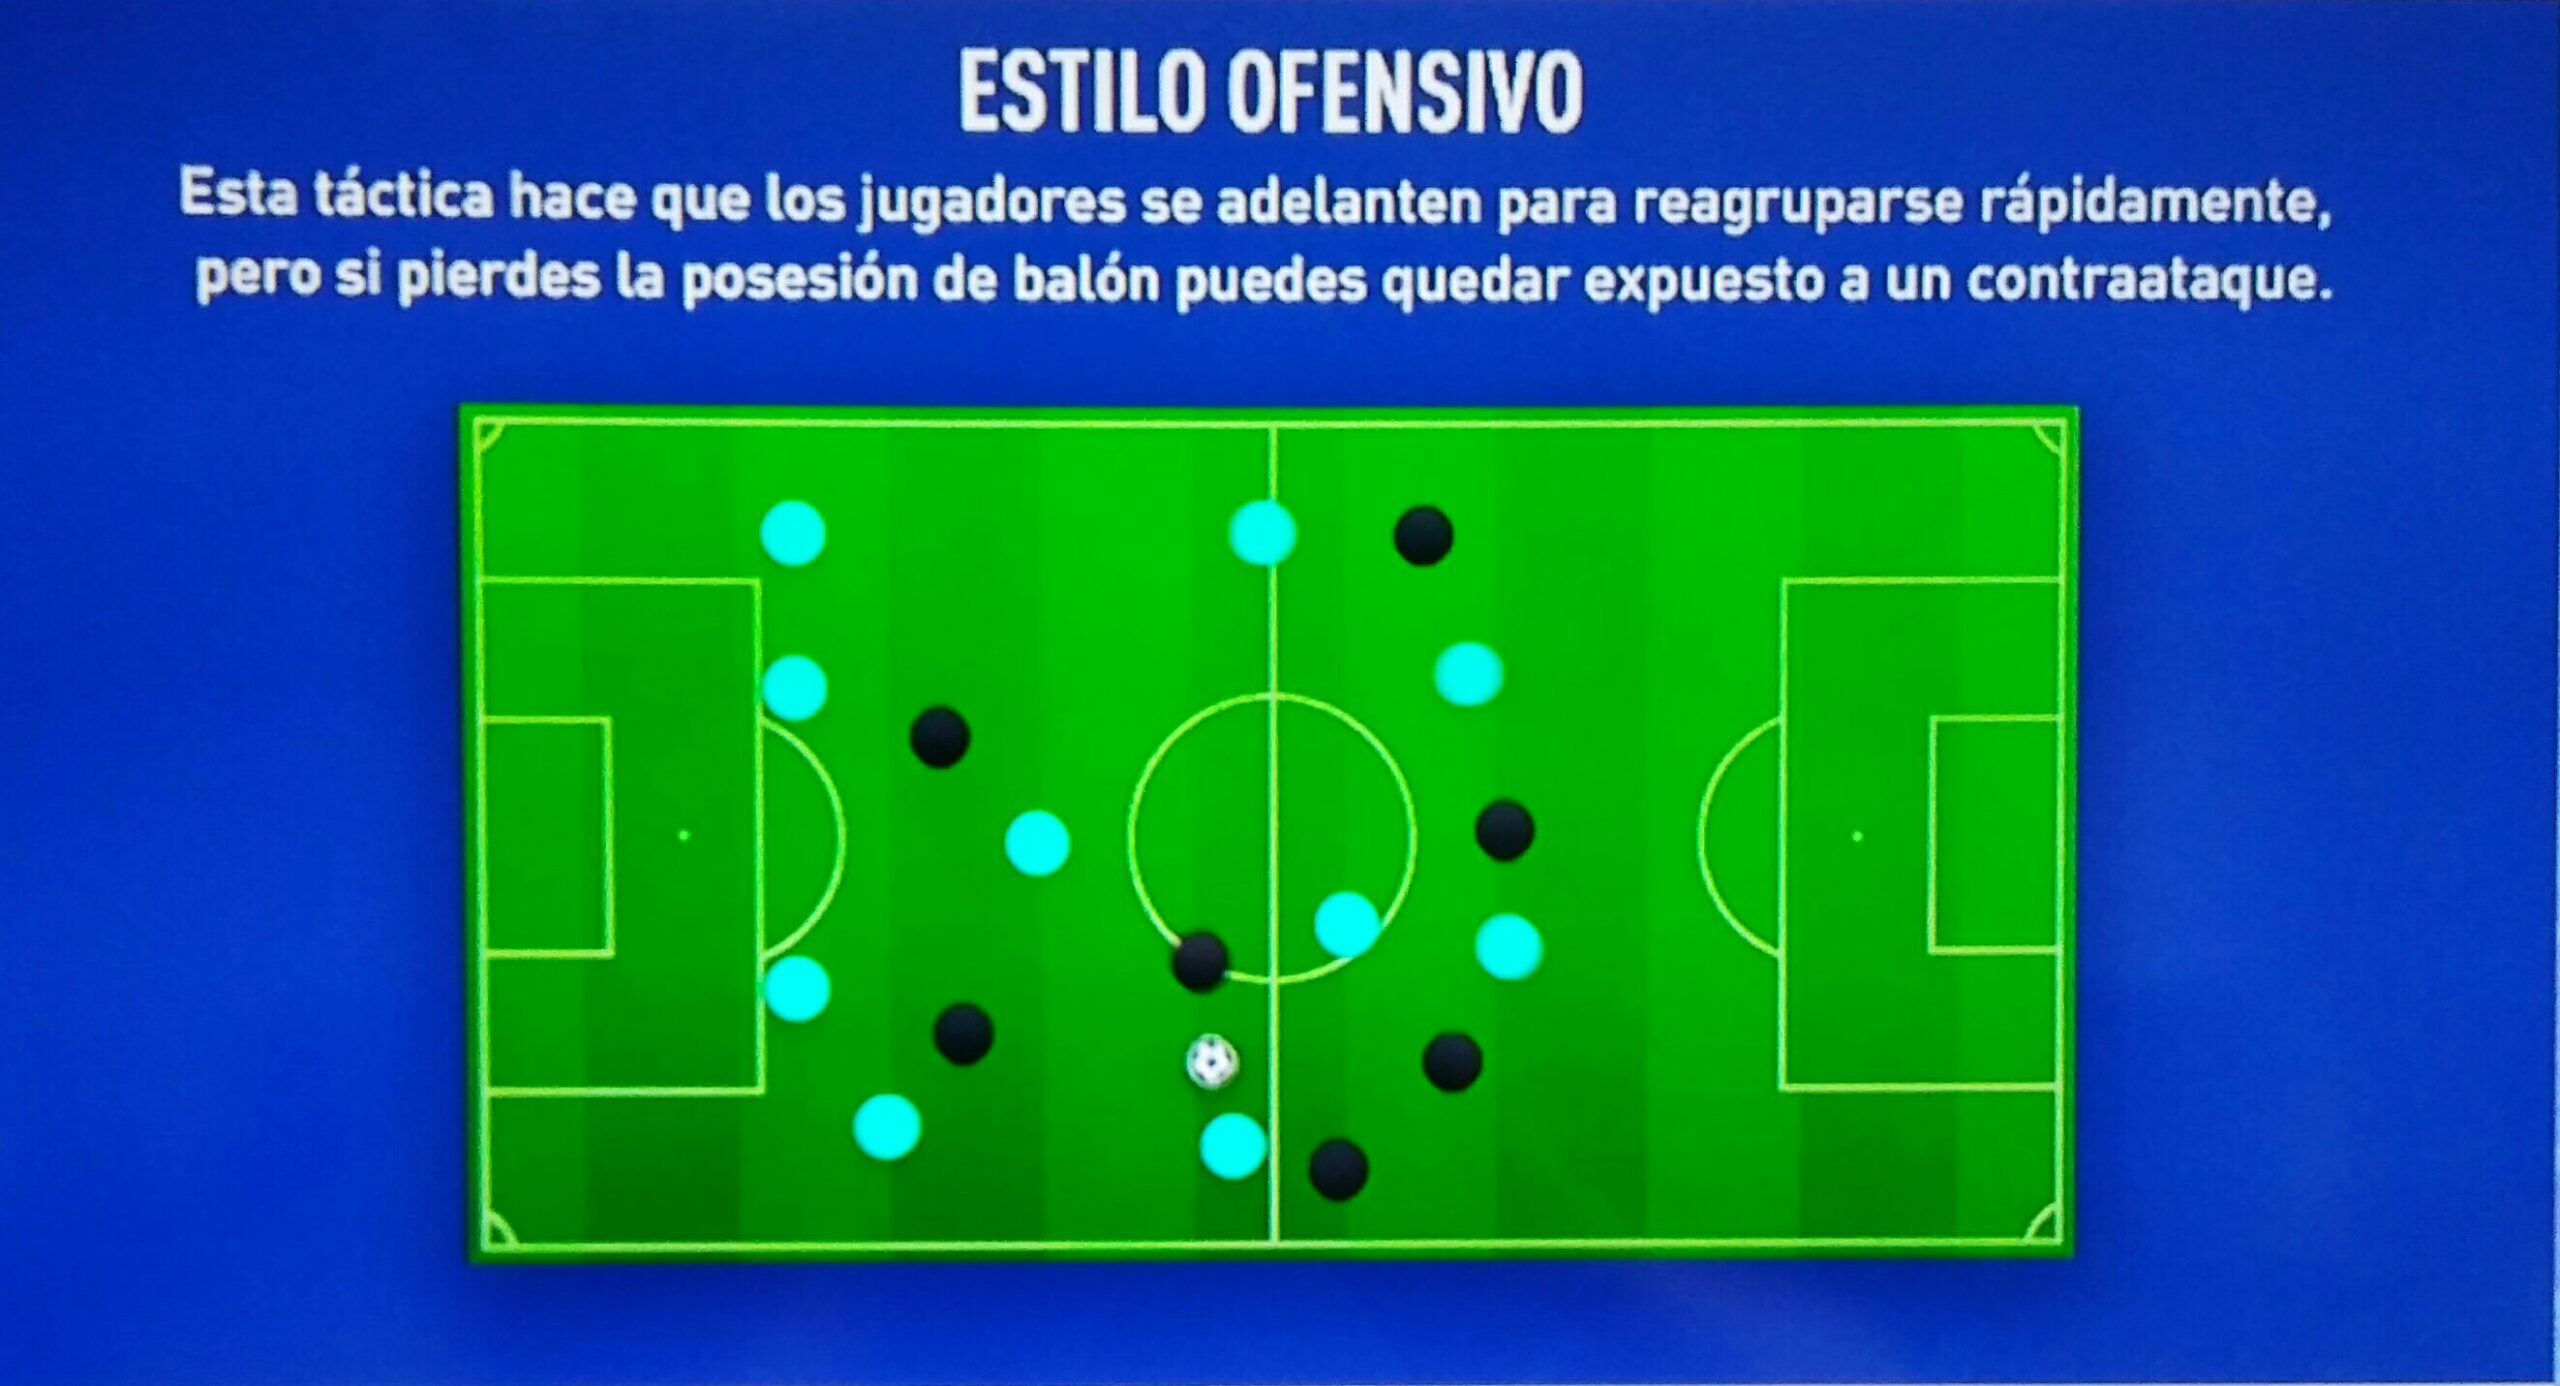 FIFA 19. Estilo Ofensivo. Rearme Rápido